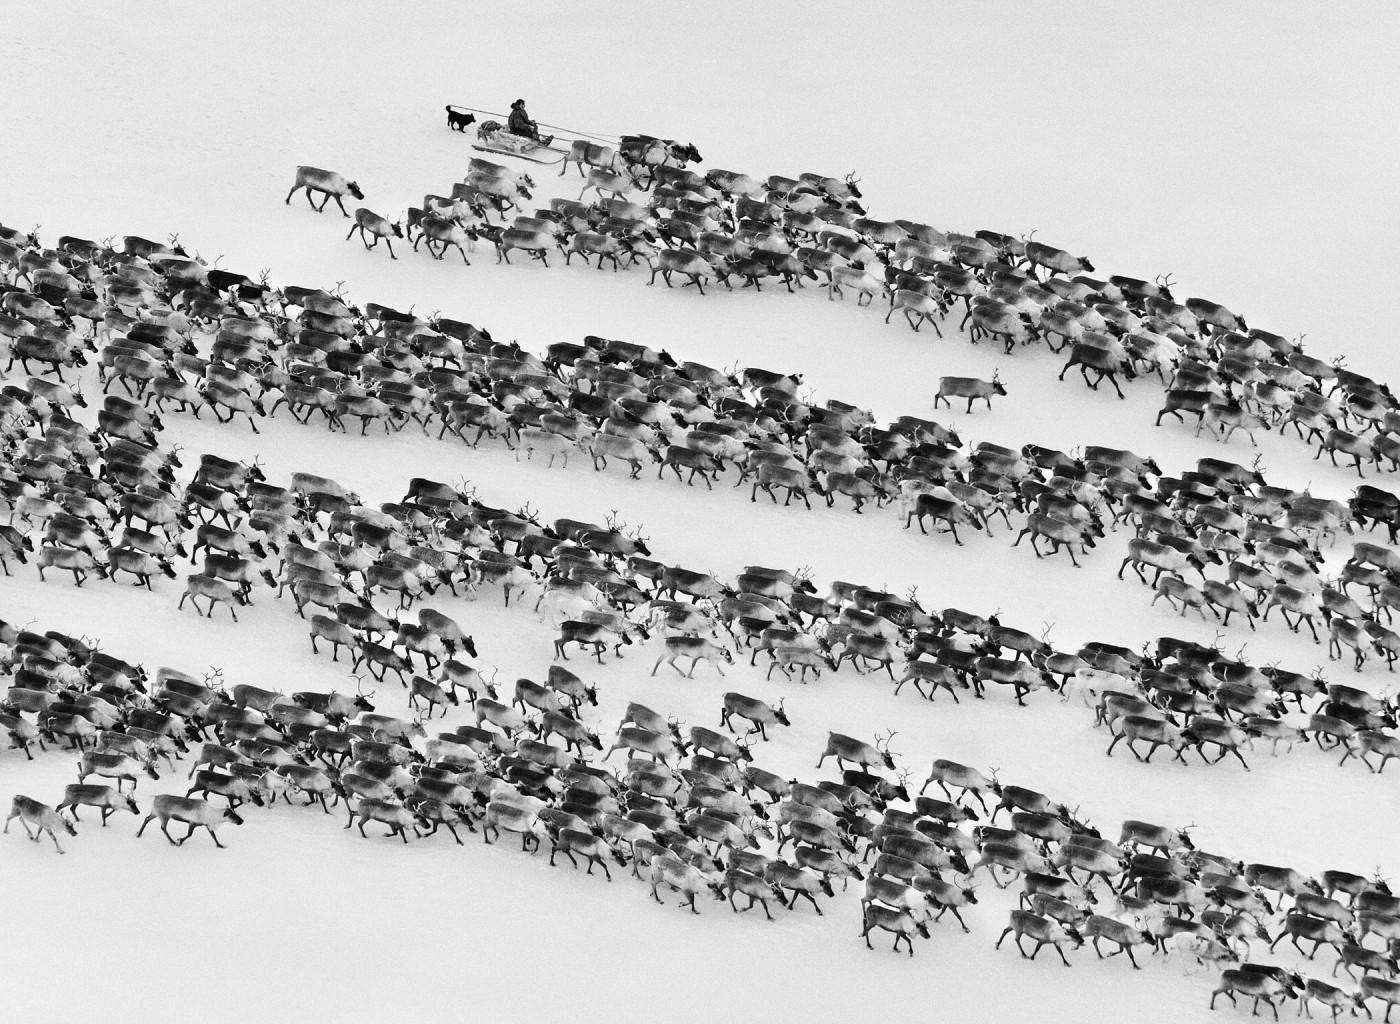 Sebastião Salgado, </span><span><em>Nenets of the Siberian Arctic, Russia</em>, </span><span>2011